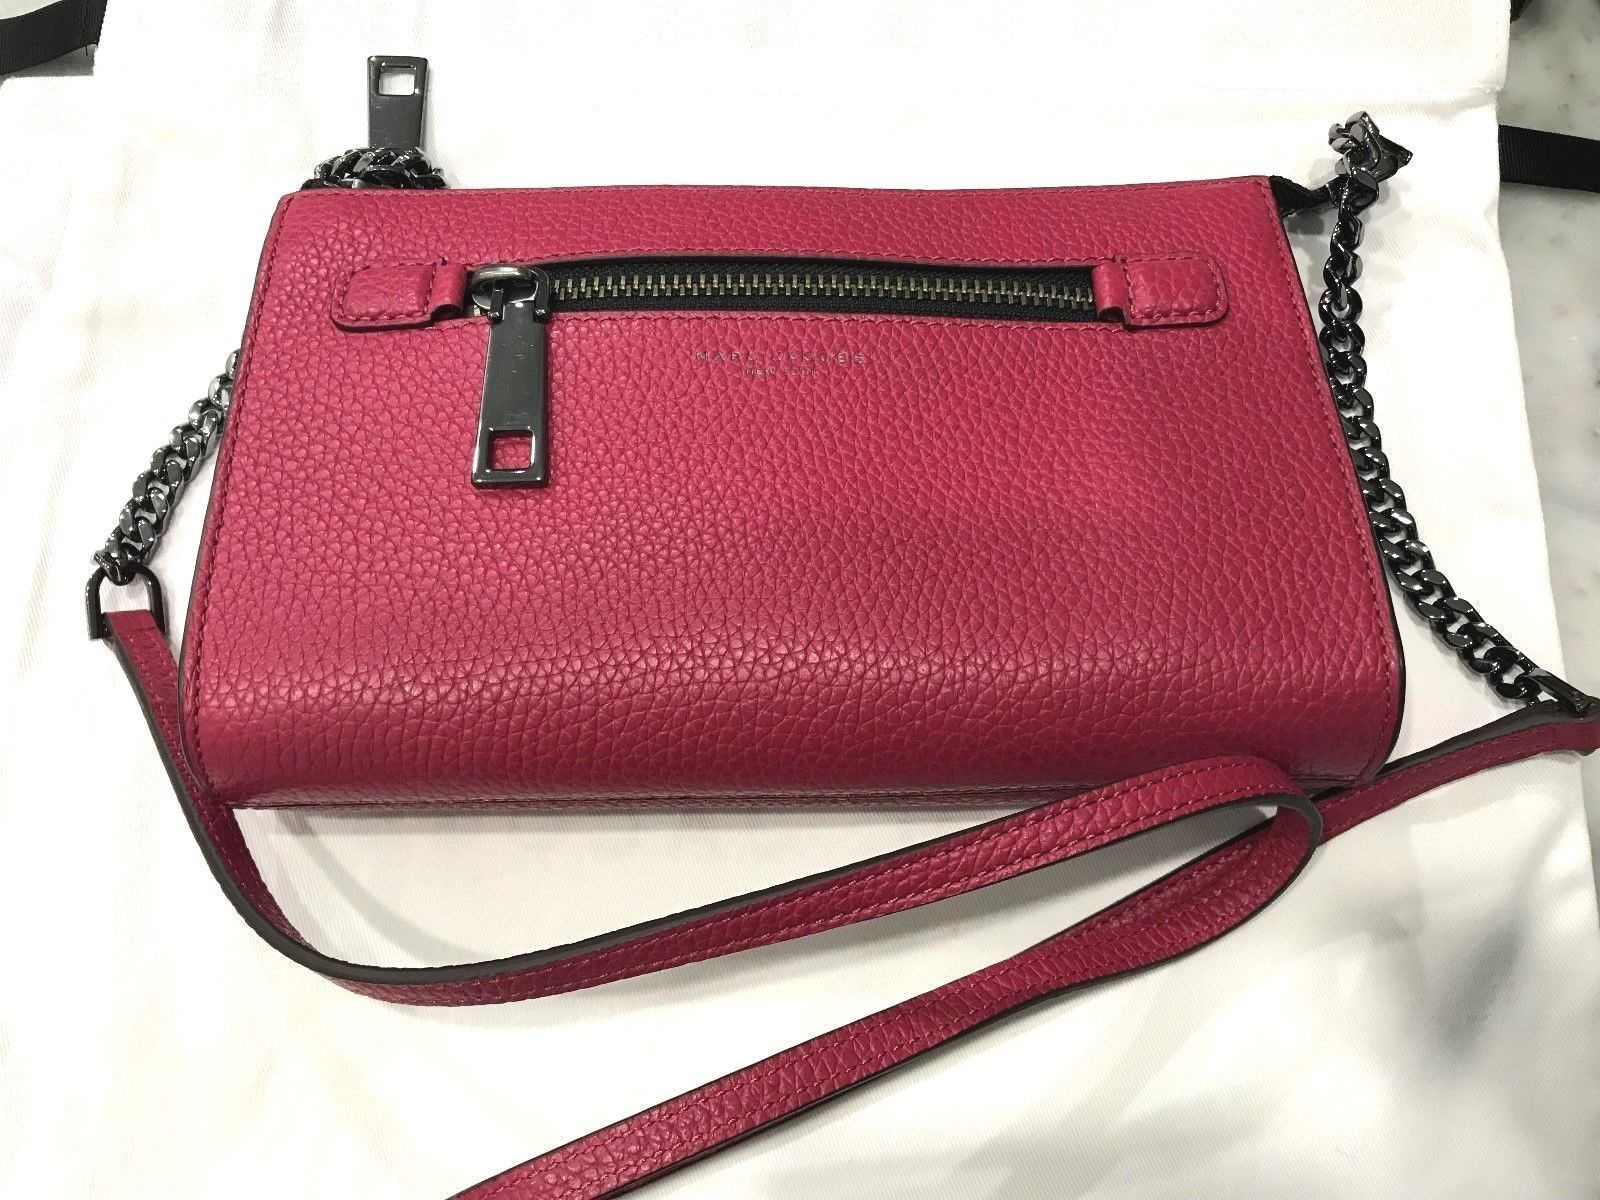 21c9d0a81a736 57. 57. Previous. Marc Jacobs Gotham Pebbled Leather E/W Crossbody Bag  Raspberry Msrp 298.00. Marc ...